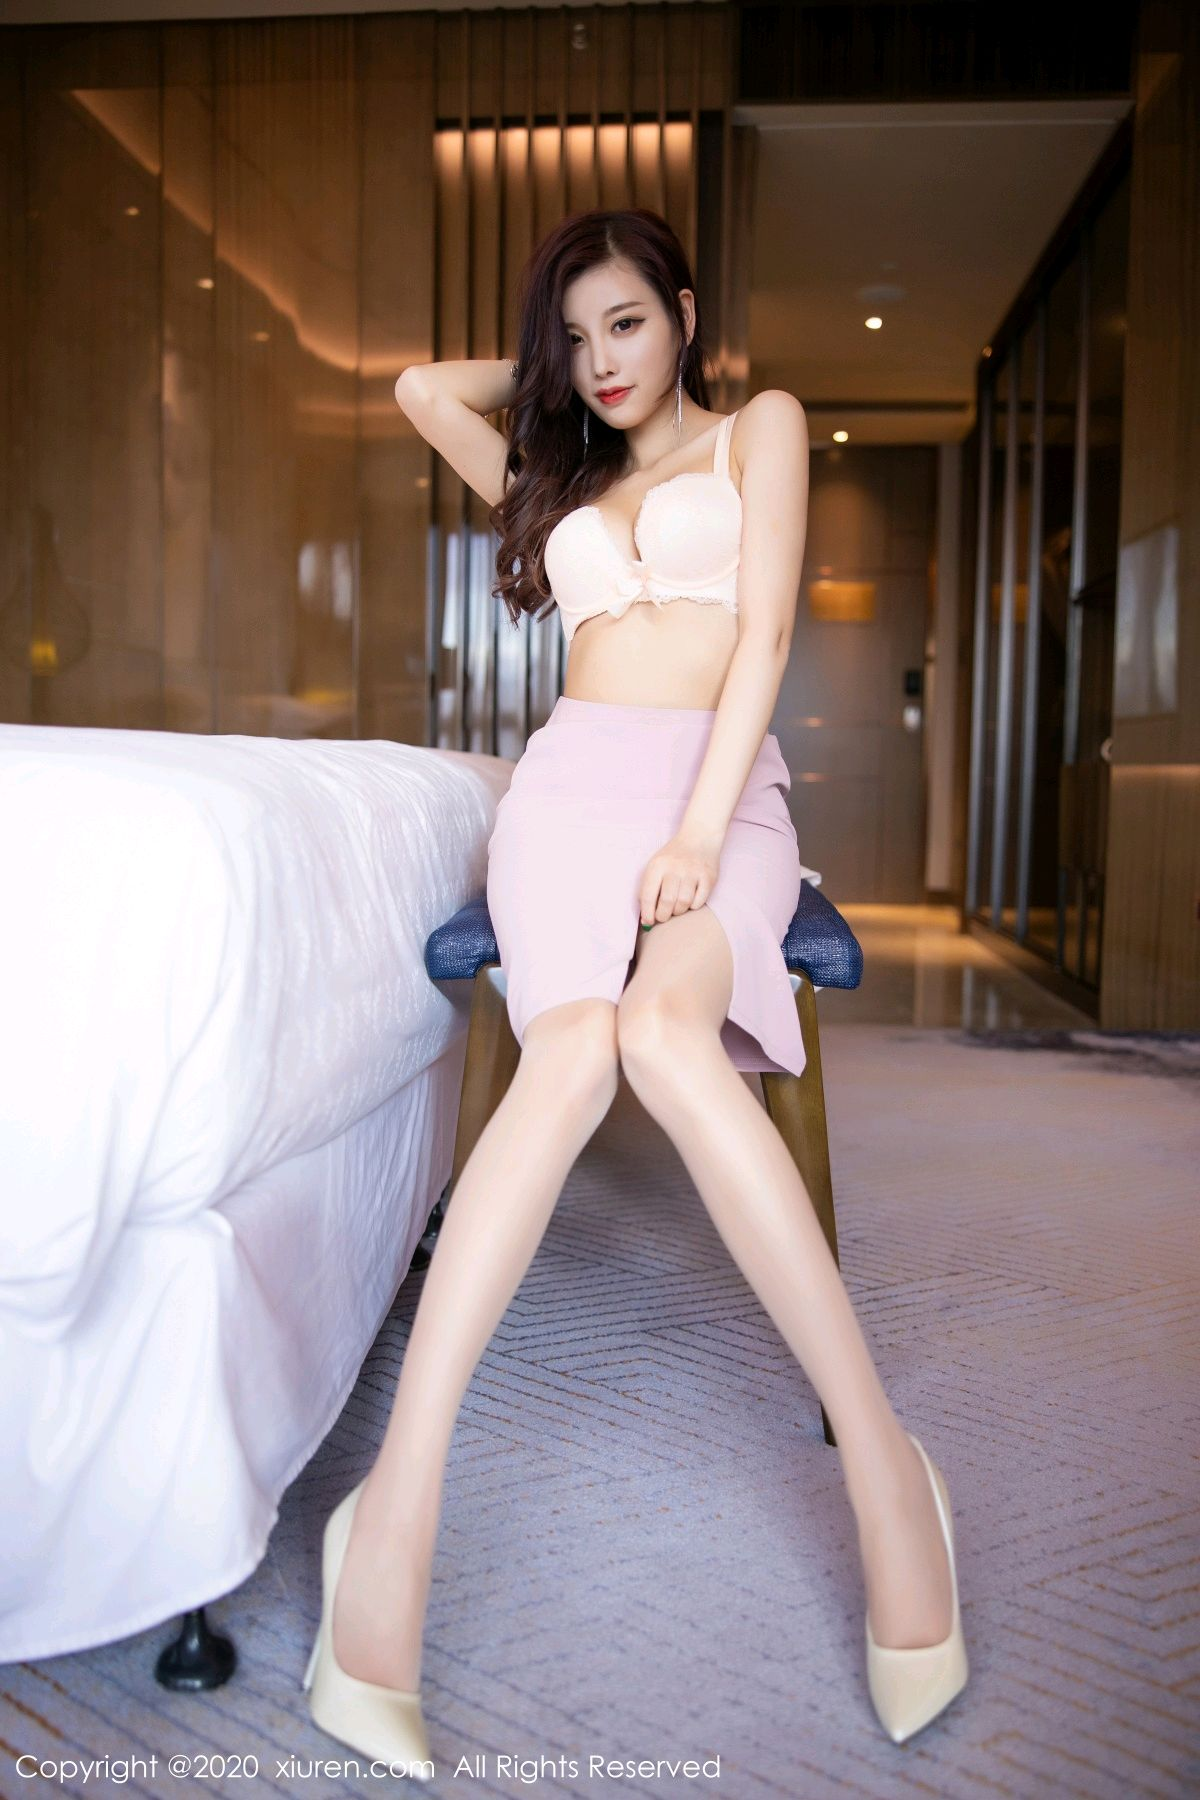 [XiuRen] Vol.2431 Yang Chen Chen 50P, Tall, Underwear, Uniform, Xiuren, Yang Chen Chen